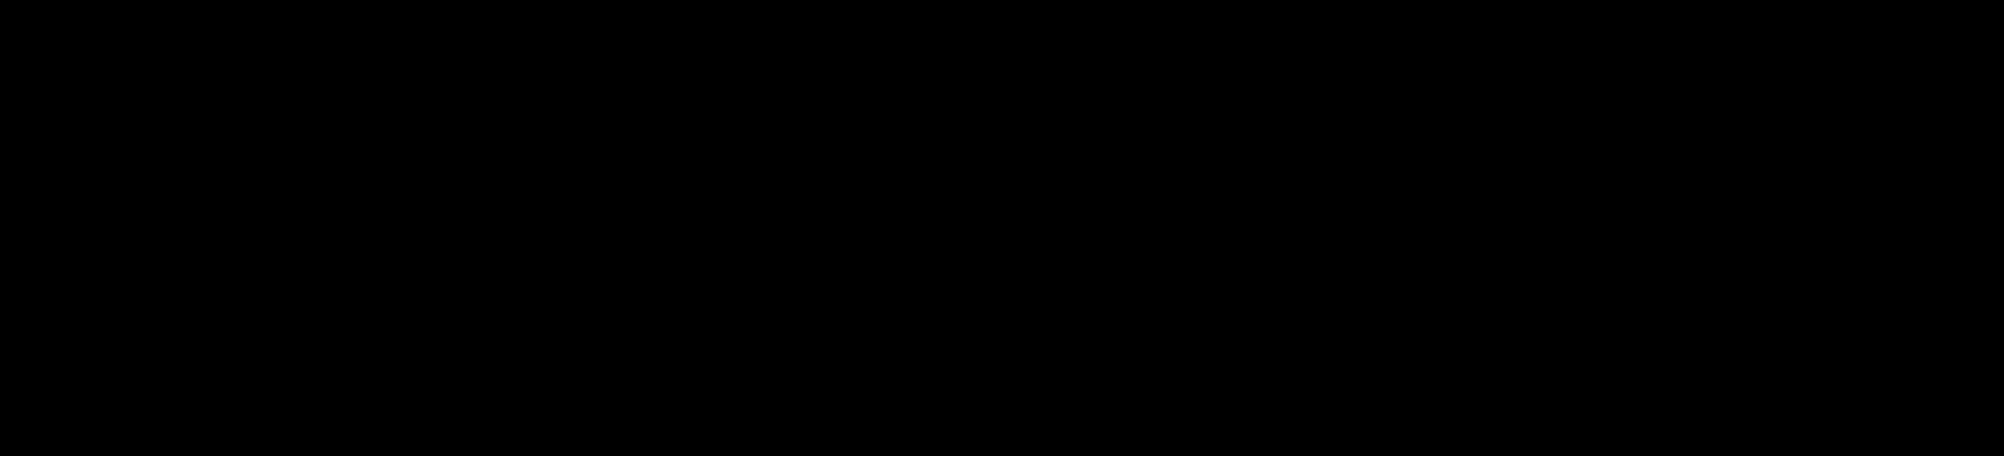 Muggenberg